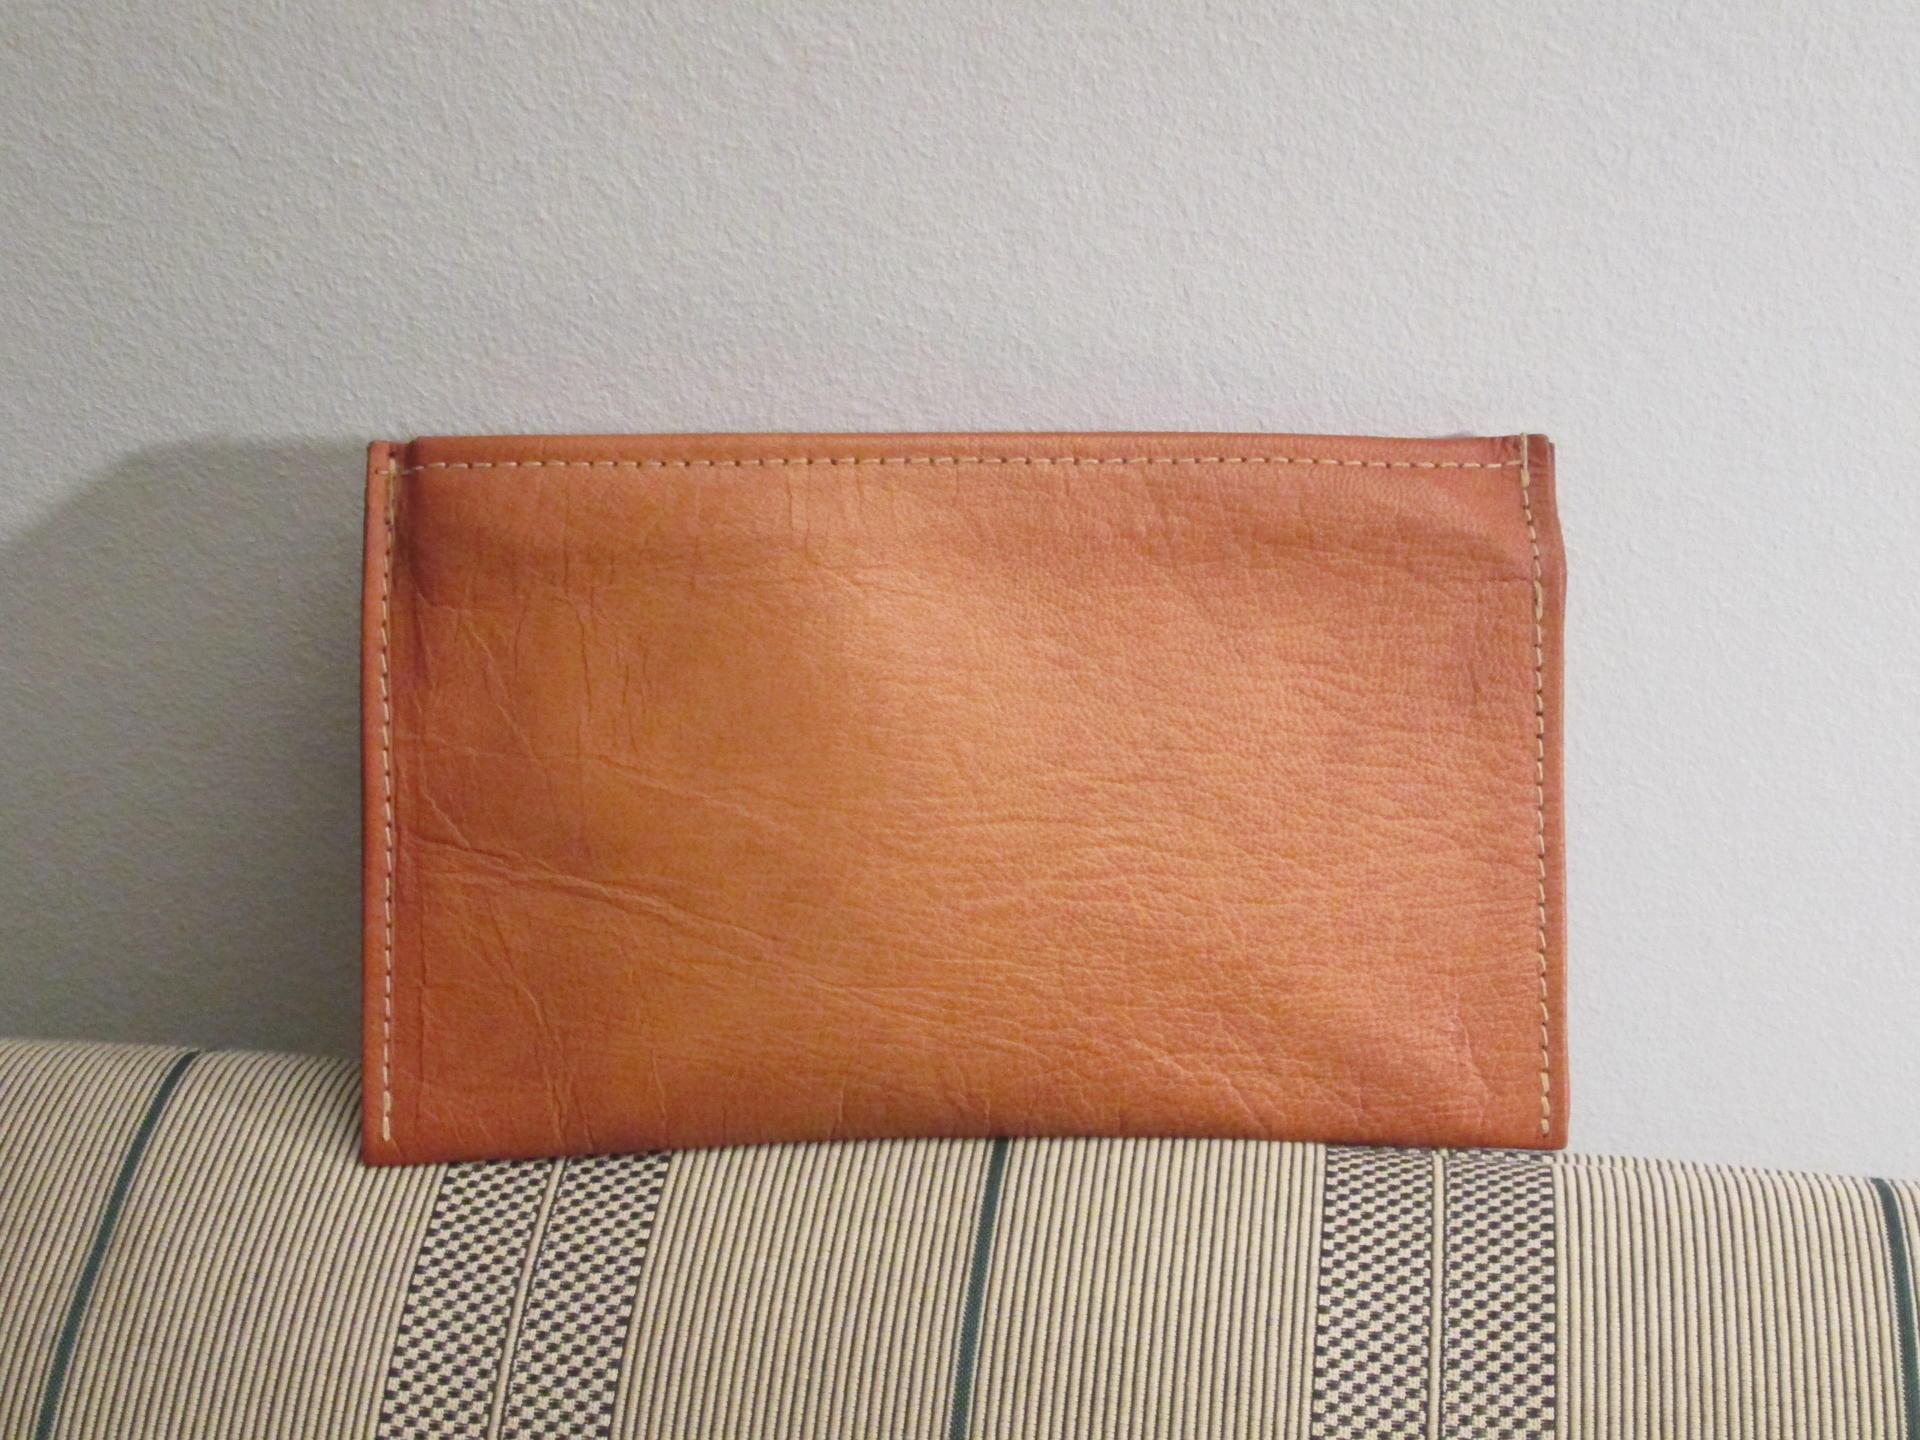 Little Lea - Cosmetic bag genuine leather - Afghanistan - Gundara